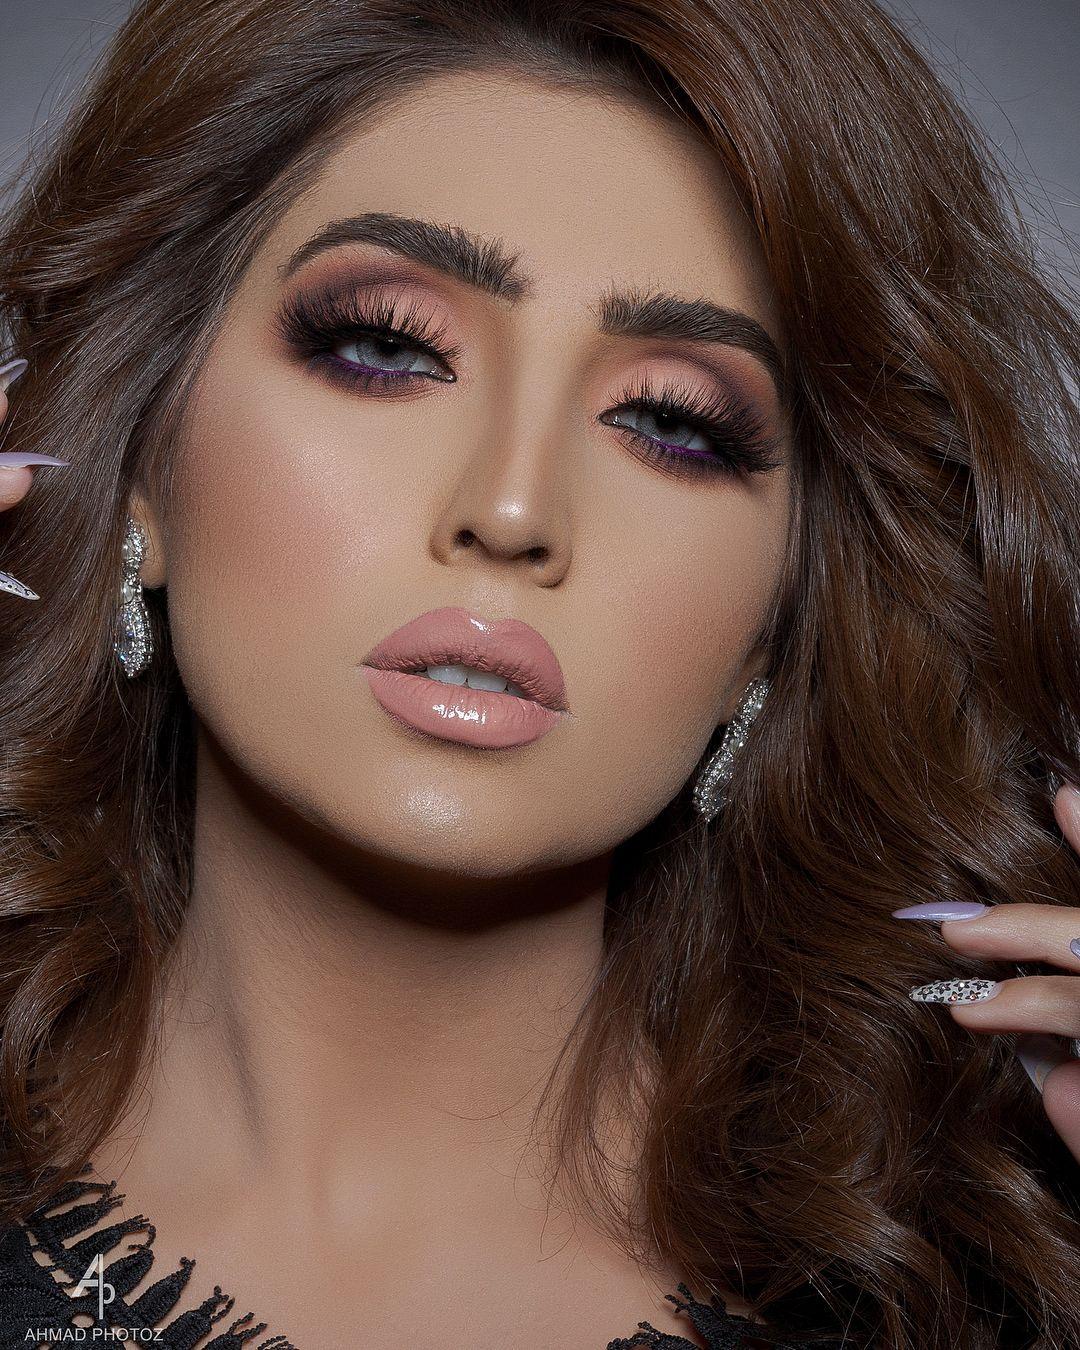 98 Likes 4 Comments Hind Makeup Artist Makeupbyhind On Instagram اللوك الأكثر طلبا من العرايس هال Glamour Makeup Day Makeup Looks Fashion Makeup